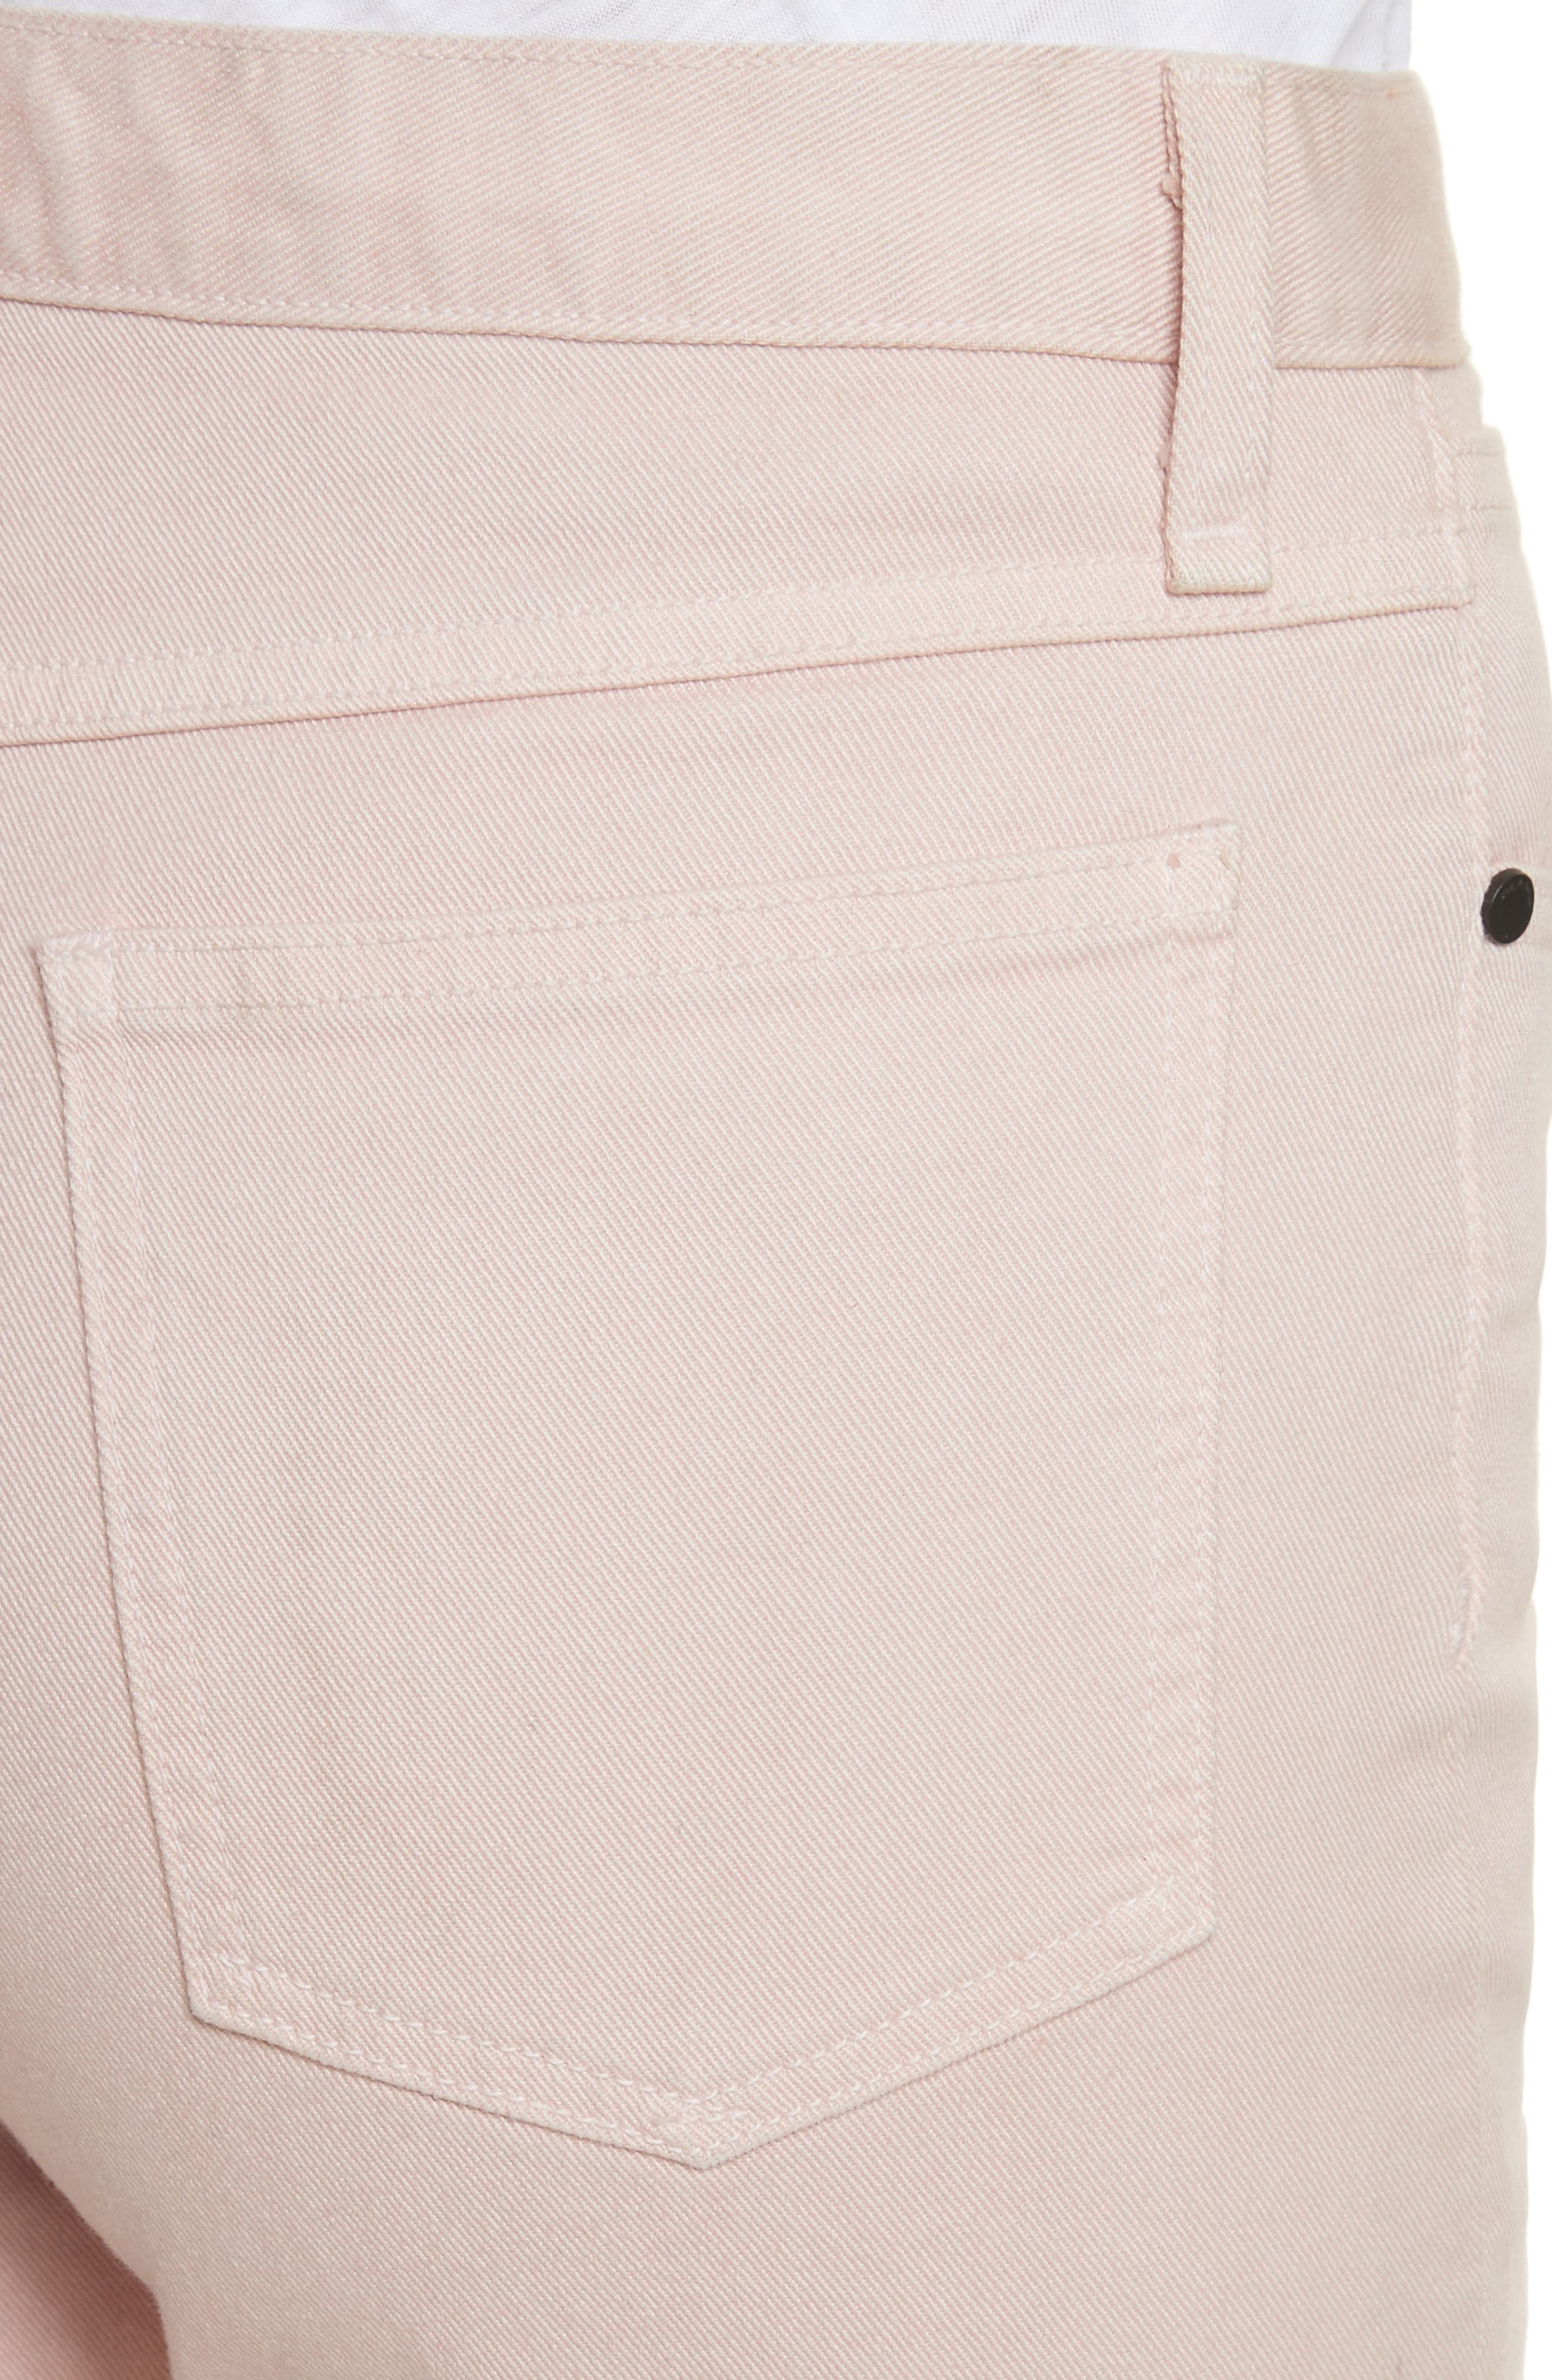 Alternate Image 4  - rag & bone/JEAN Justine High Waist Trouser Jeans (Blush Twill)